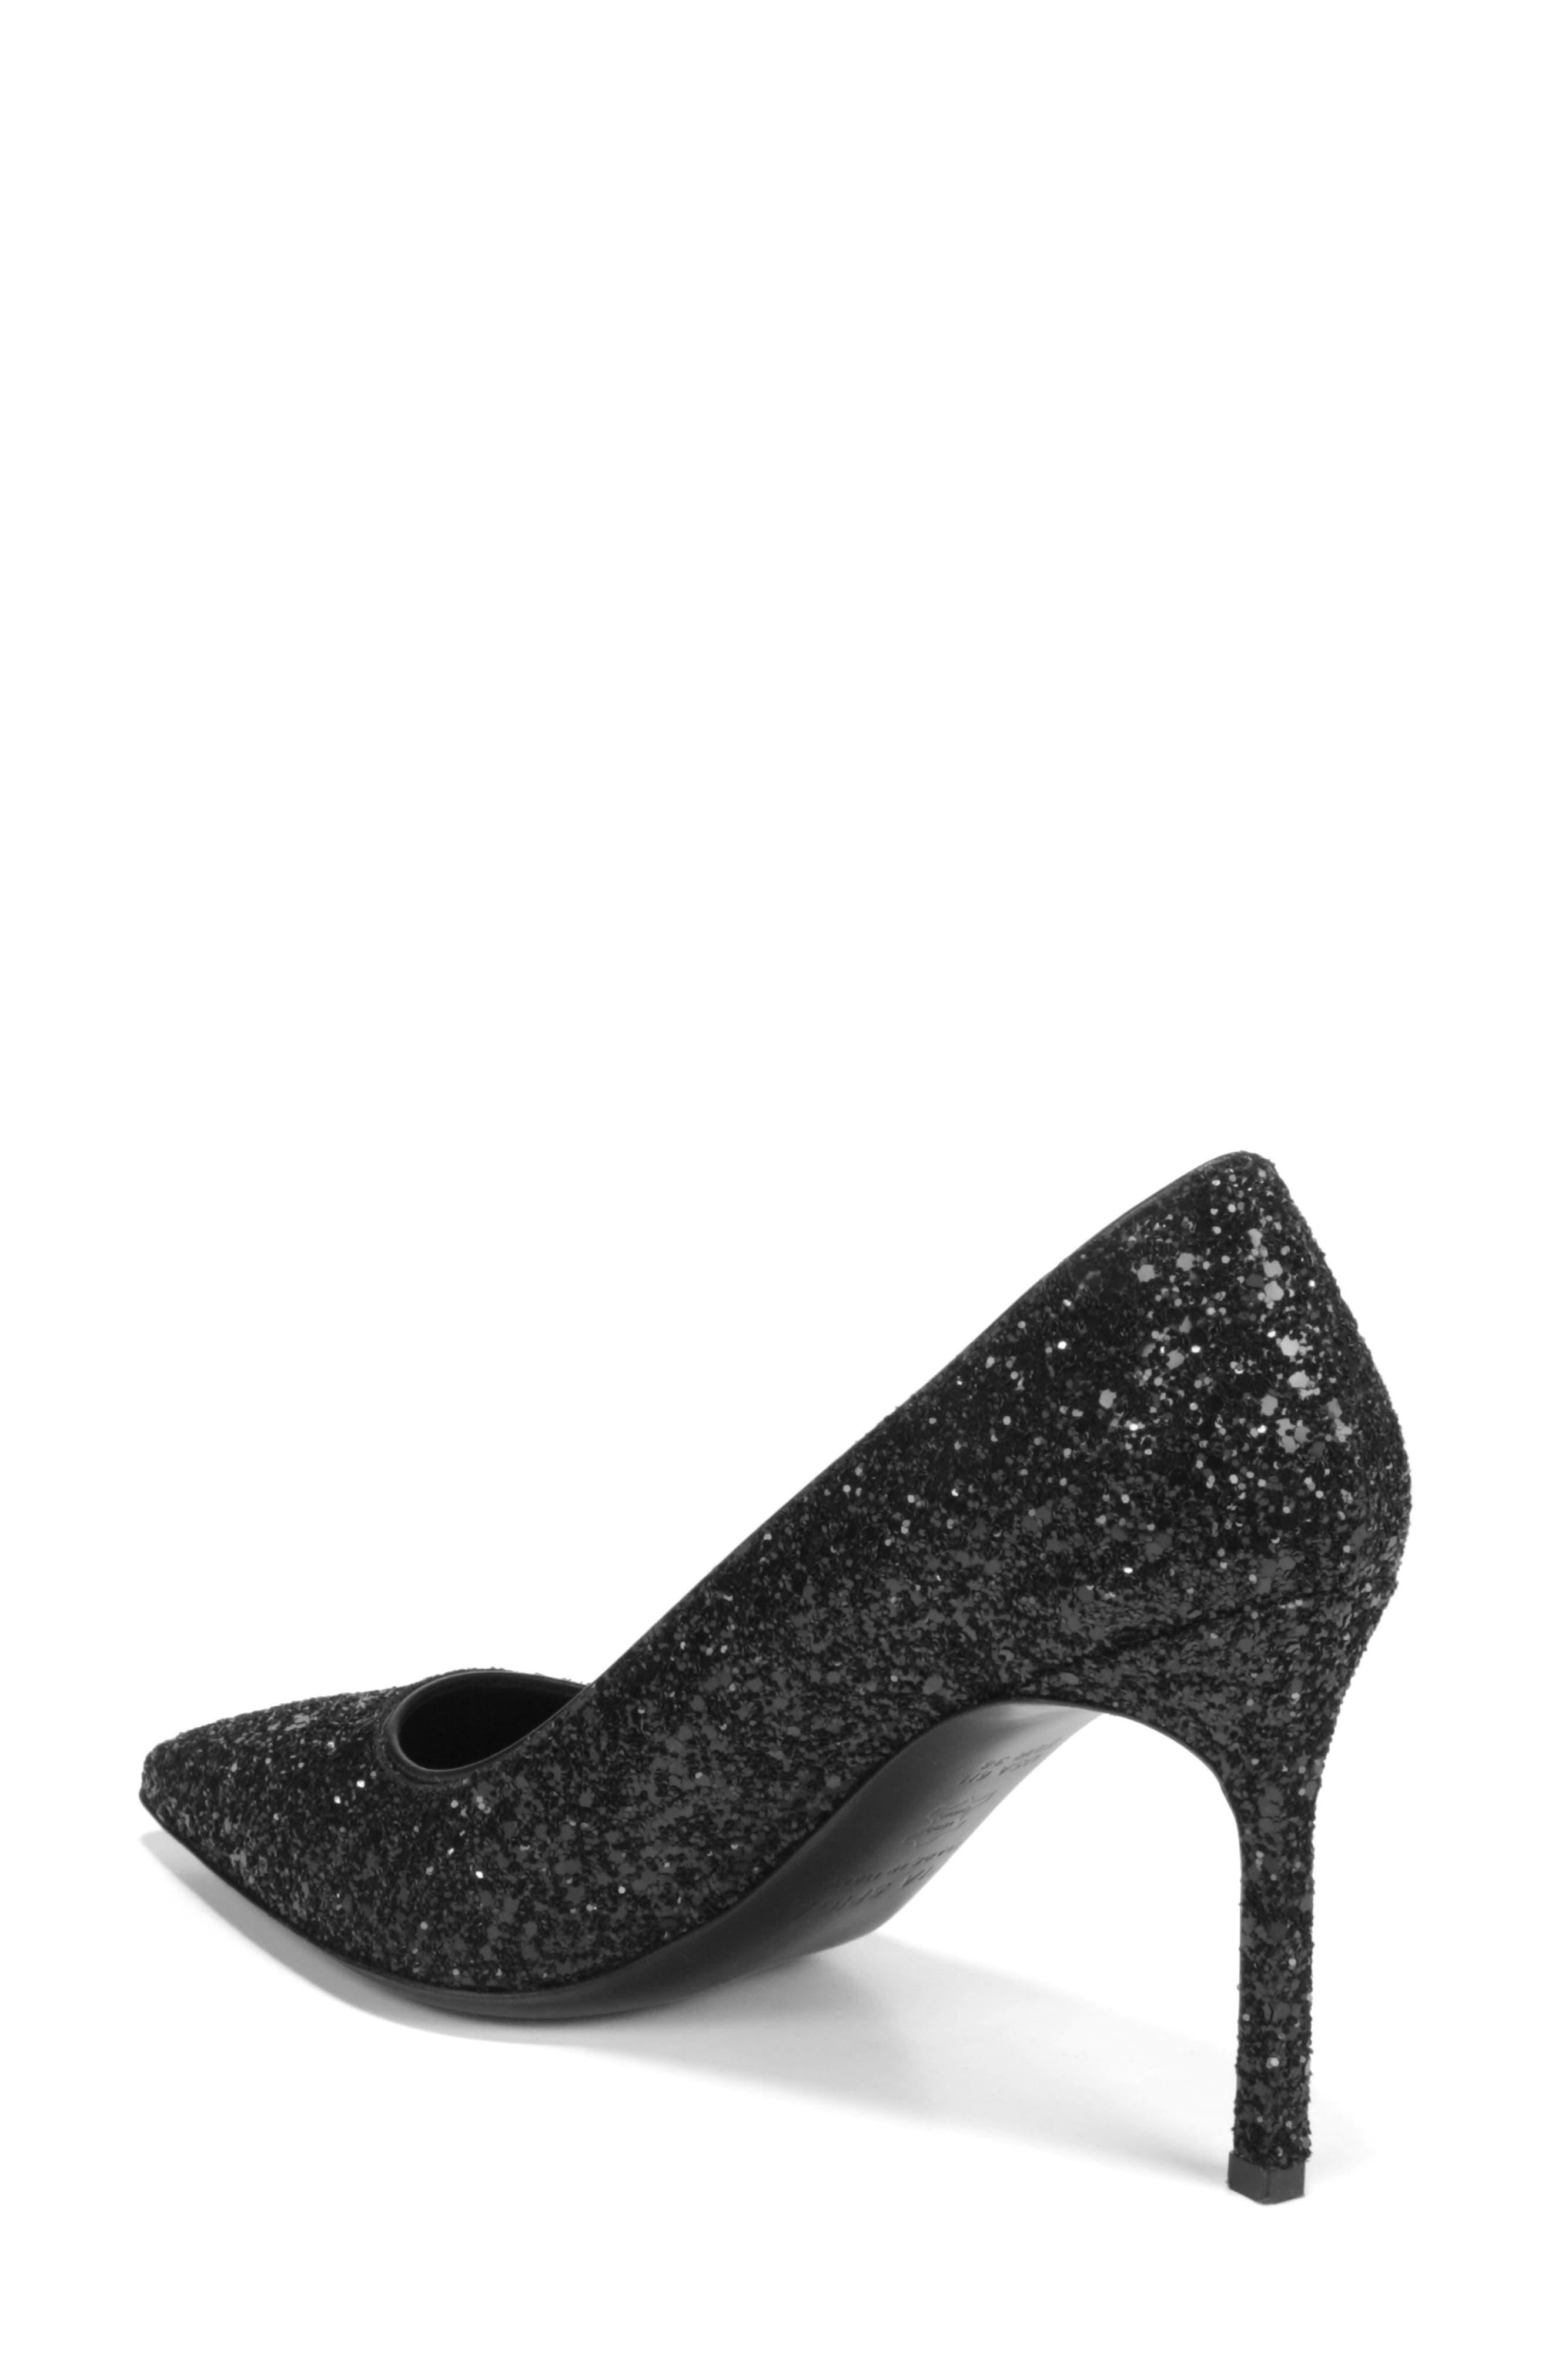 3b6eb660c014 Women's Via Spiga Shoes | Nordstrom